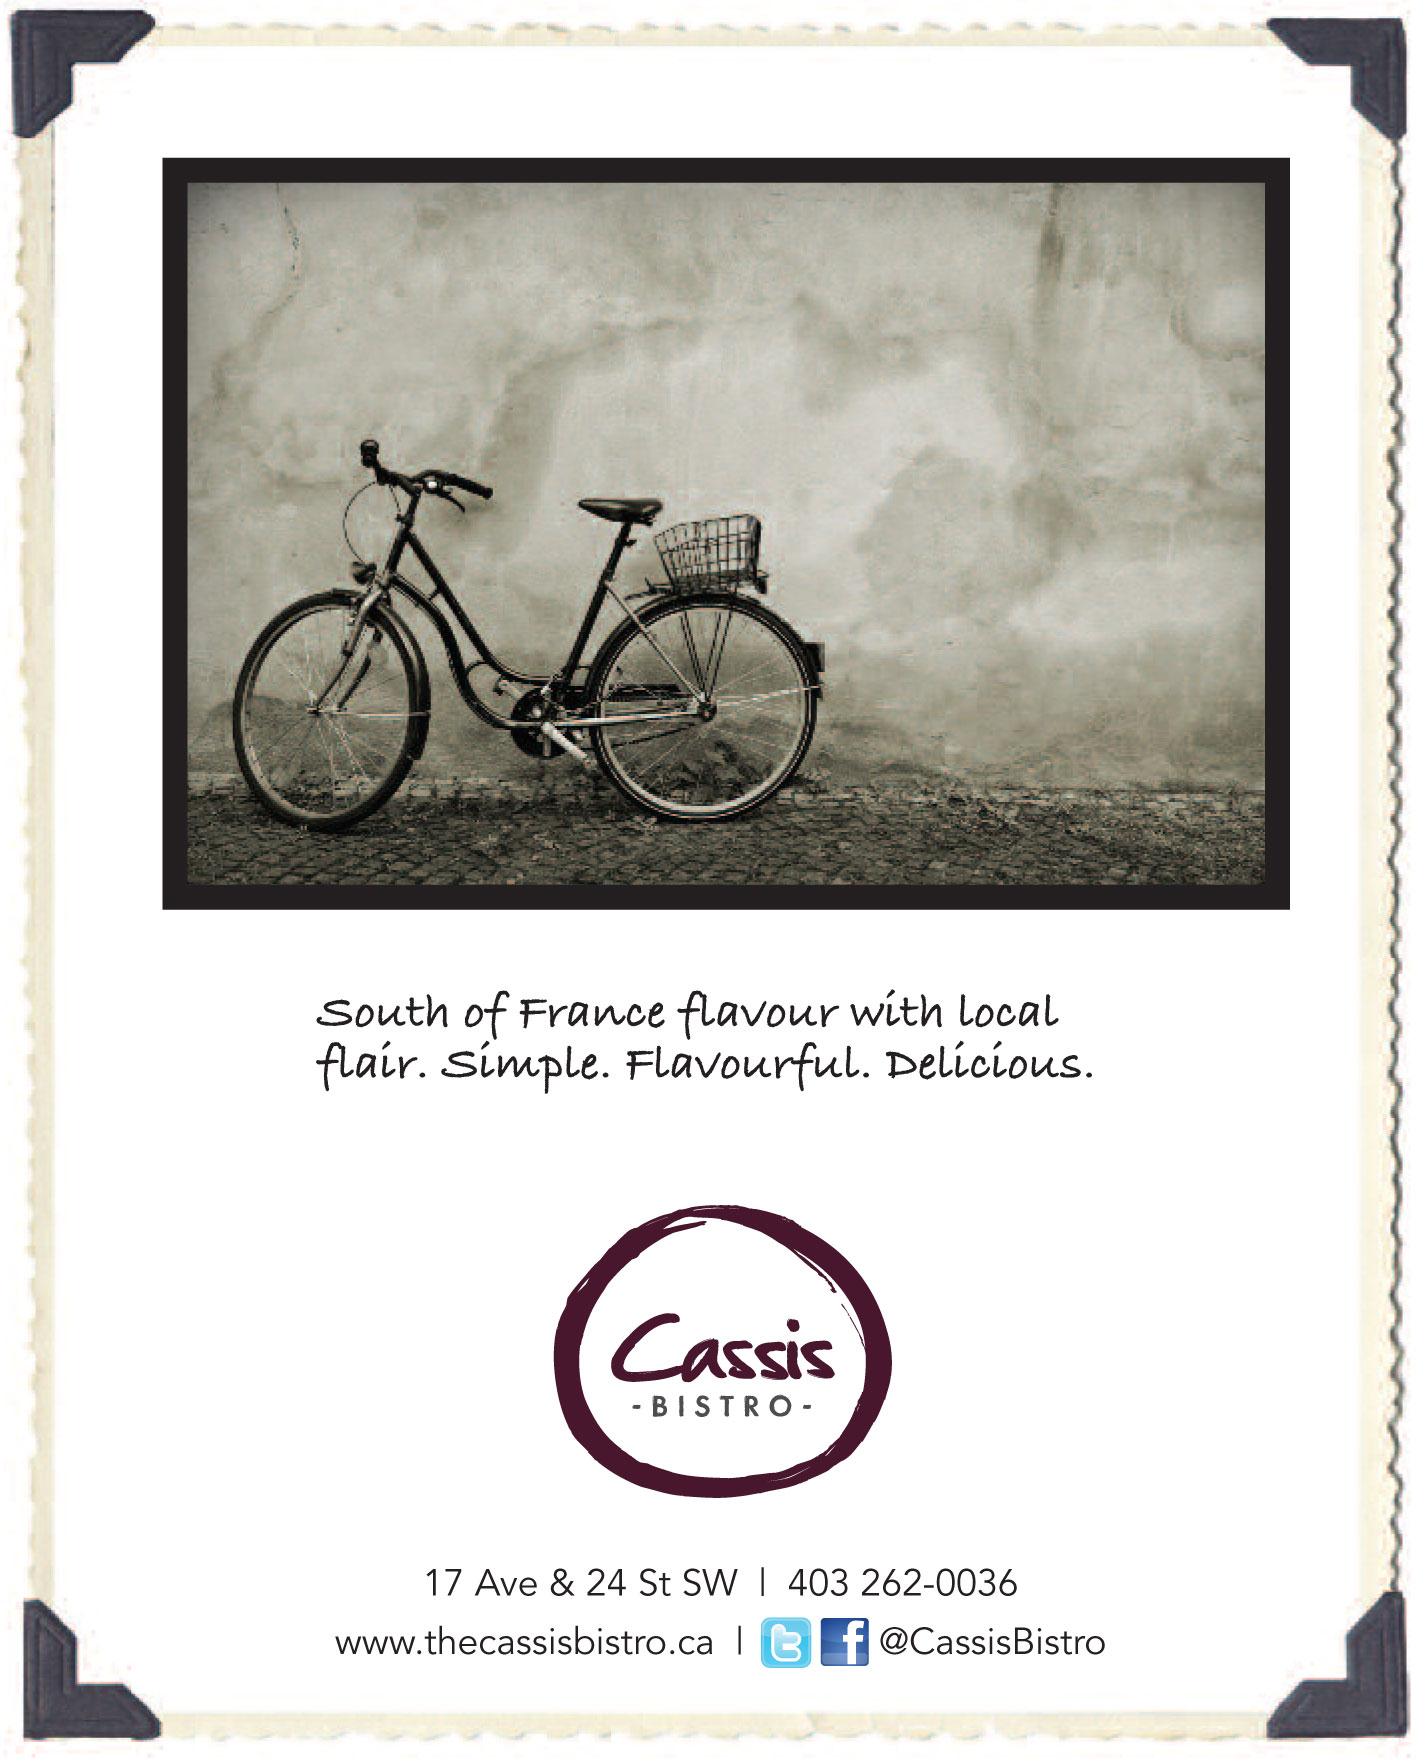 Cassis-sponsorAd17Apr_2.jpg